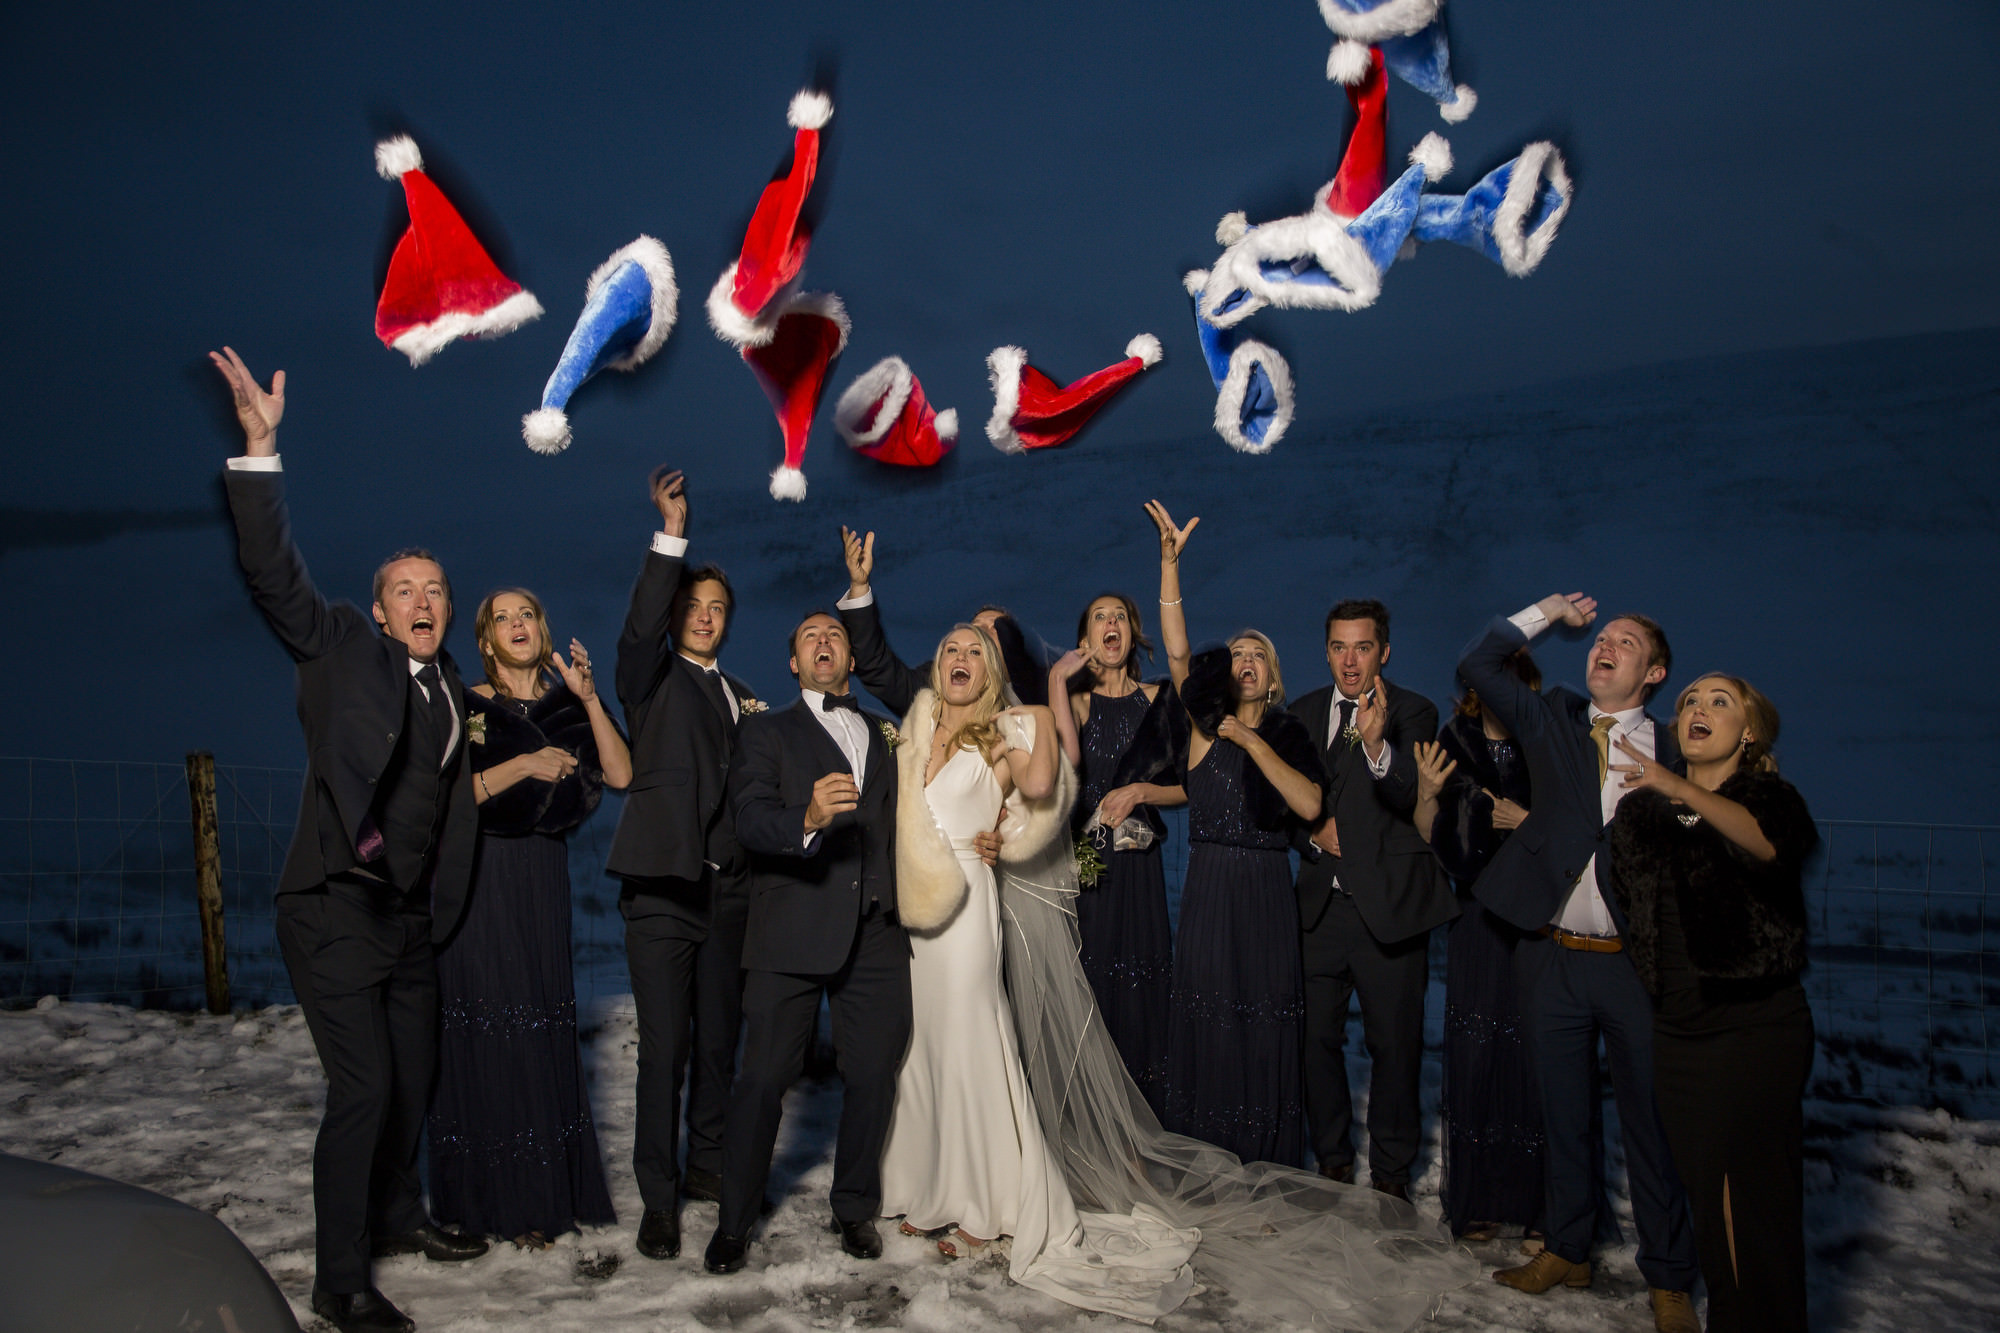 muckross_park_hotel_grougane_barra_wedding_photographer_goldenmoments_062.jpg